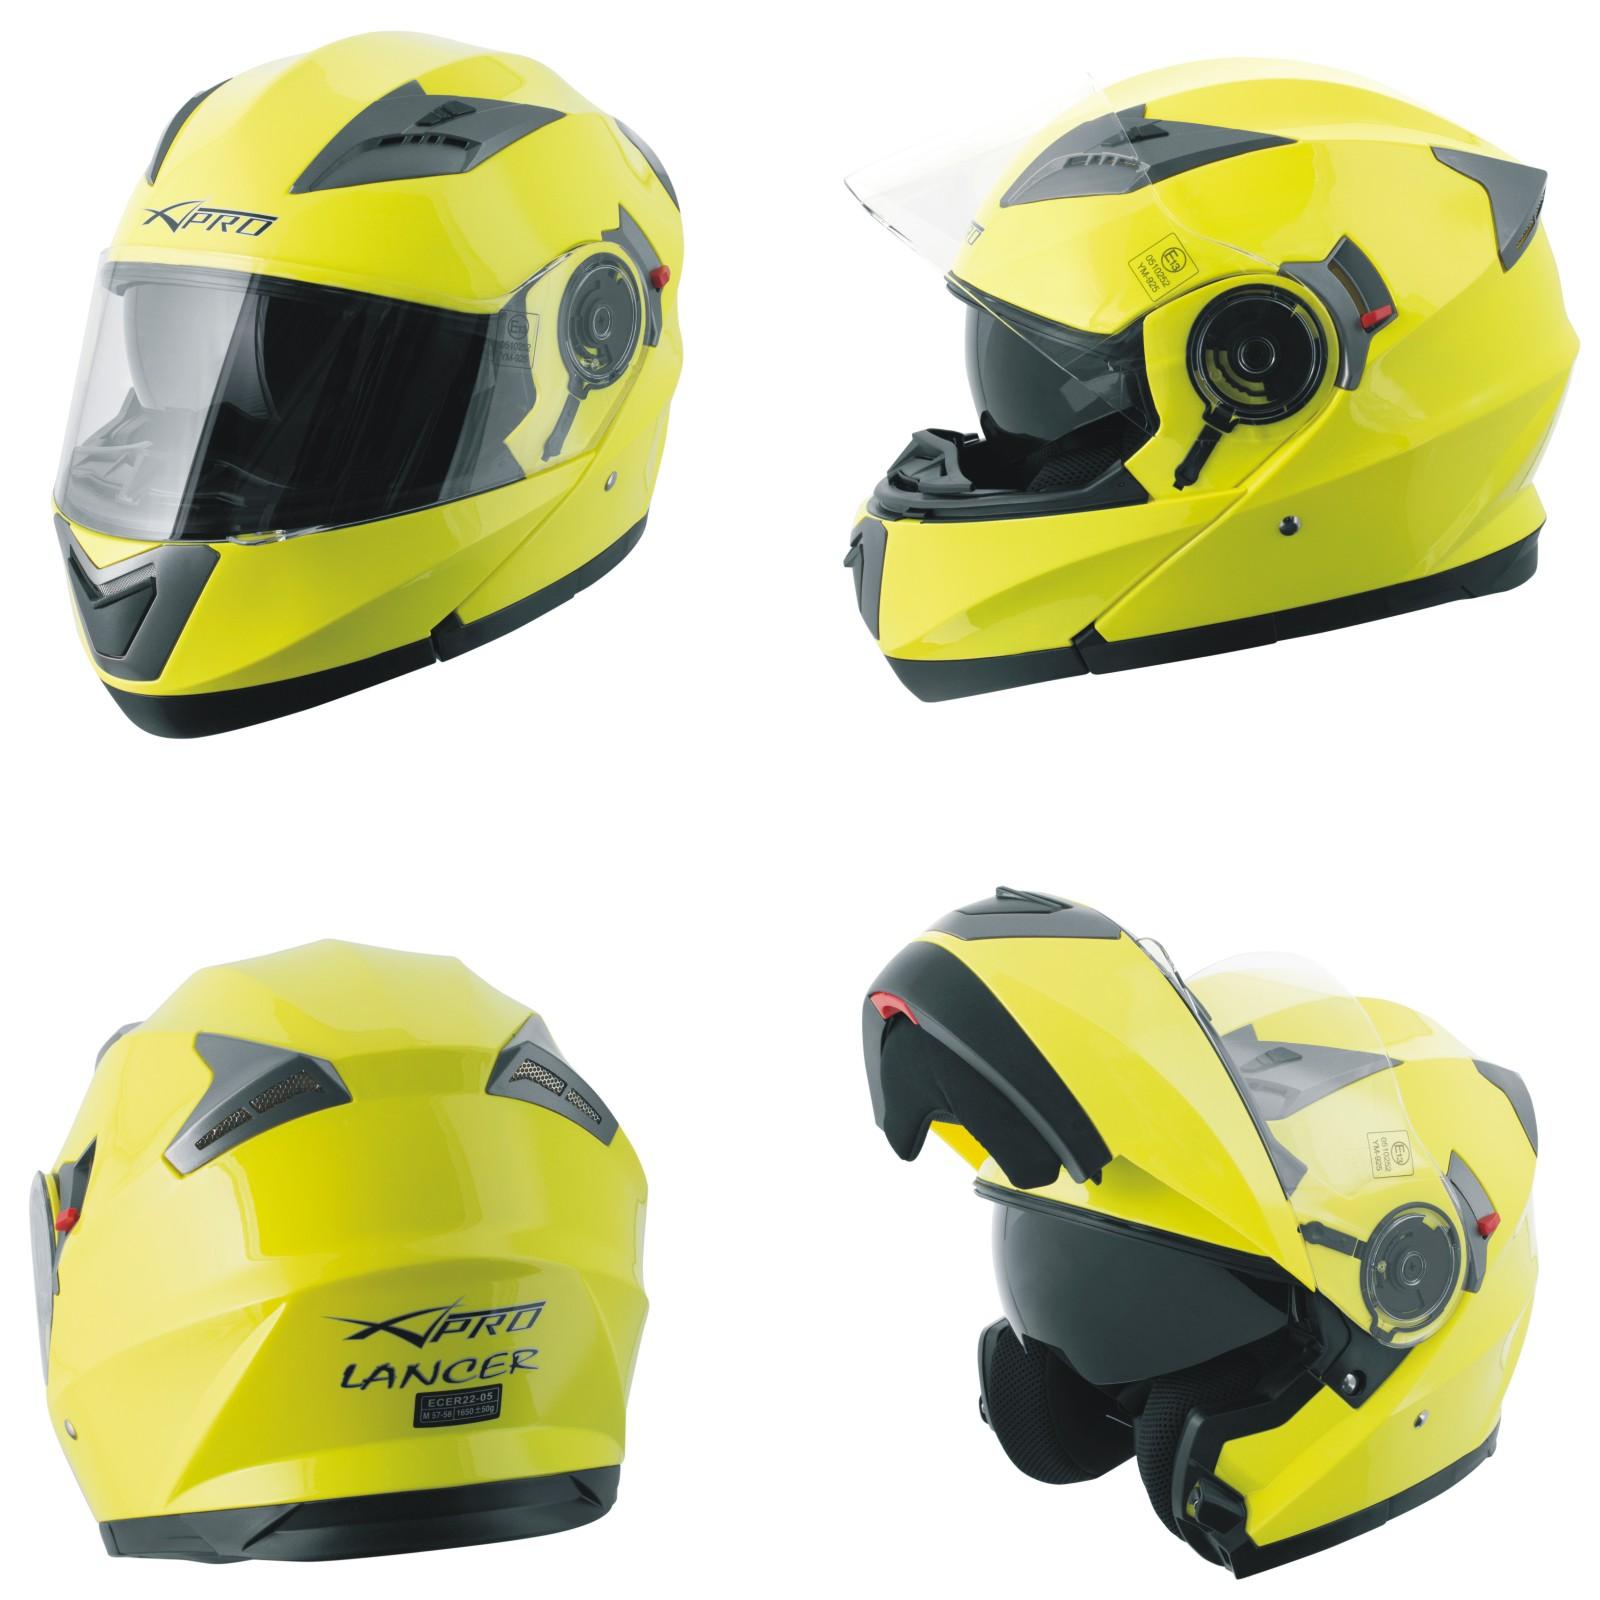 Casco-Modulare-Apribile-Moto-Touring-Sport-Visiera-Parasole-Giallo-Fluo